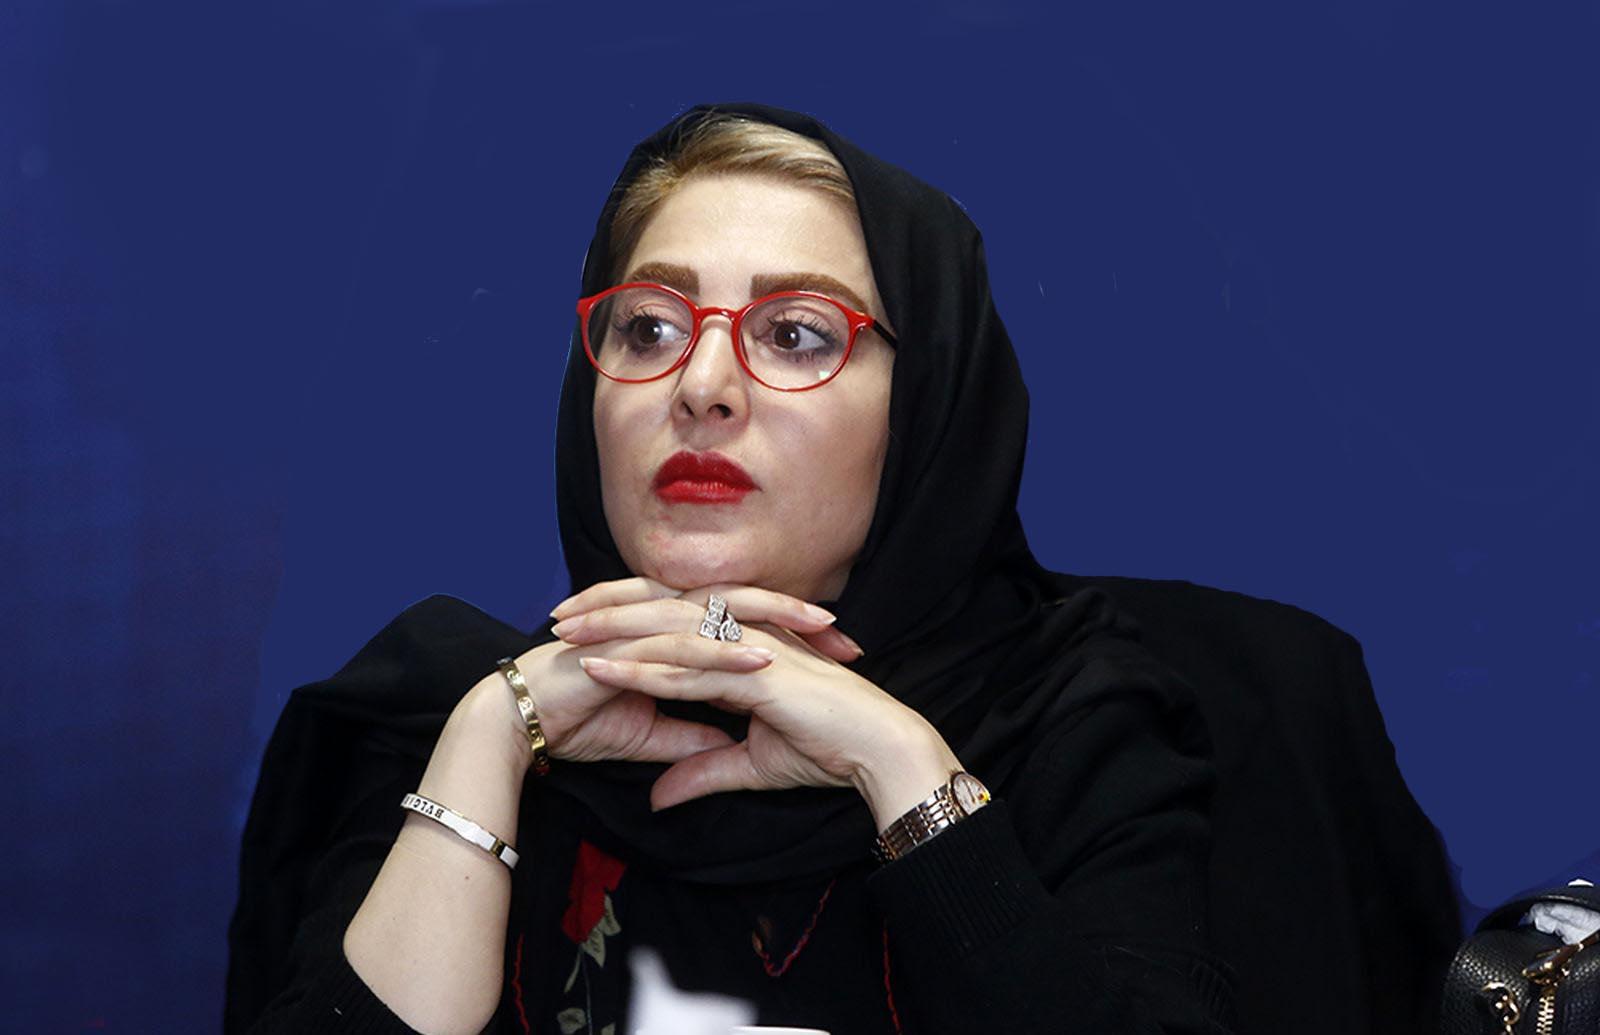 ژیلا صادقی